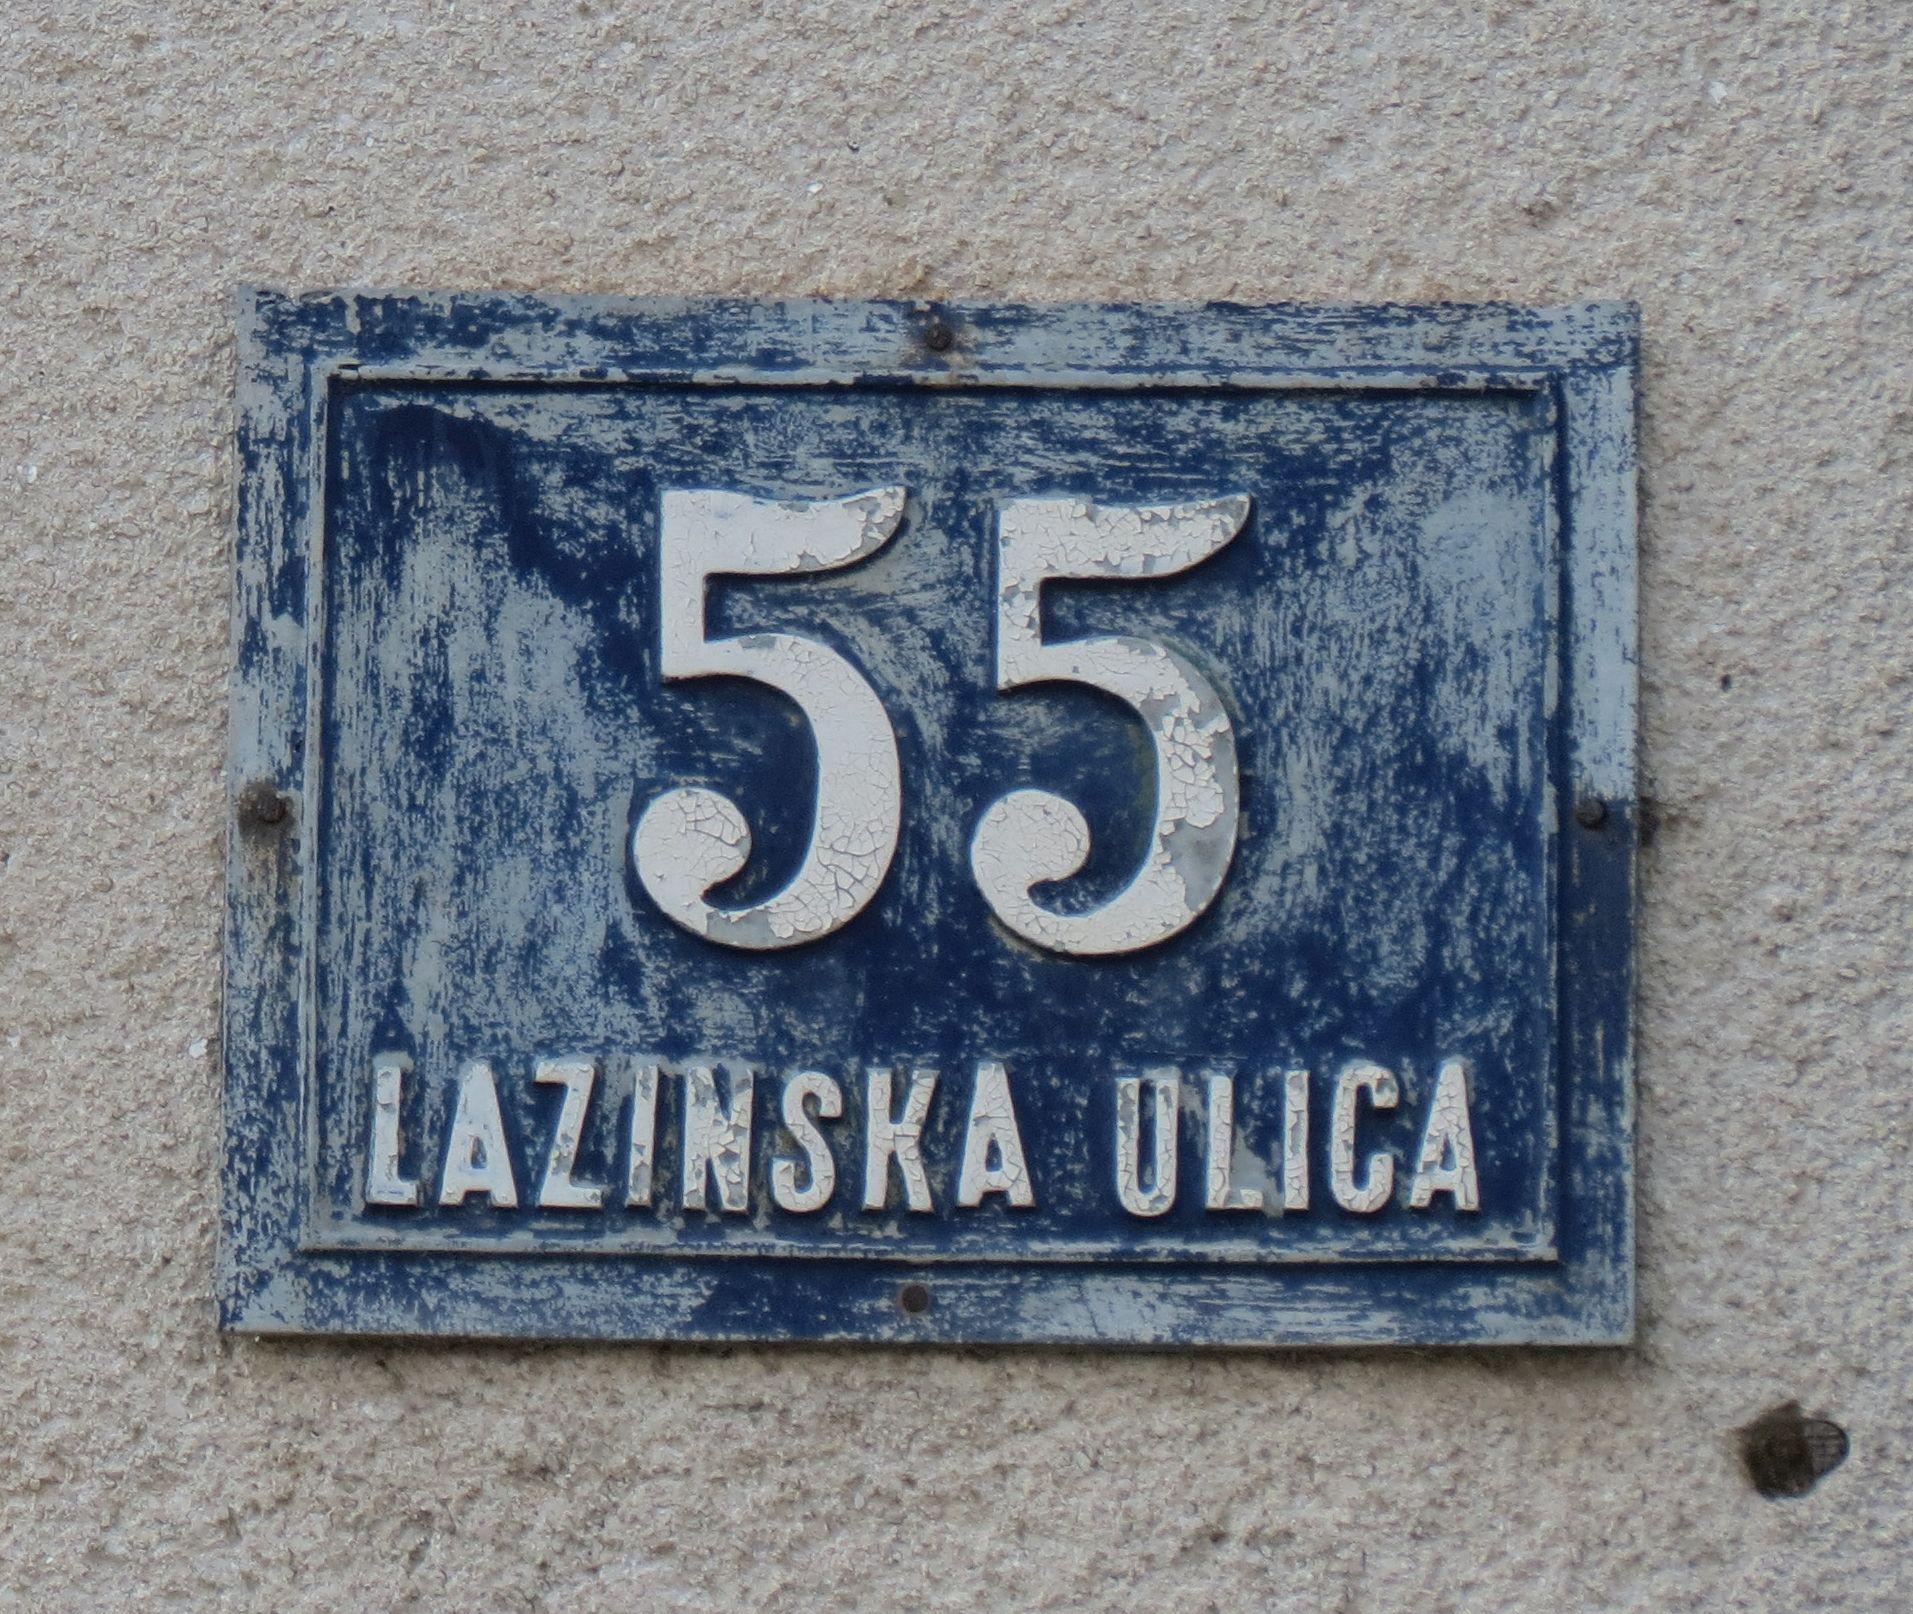 Kućni broj iz predratnog razdoblja sa područja izvan grada Zagreba (Rudeš) [VR 2020.]